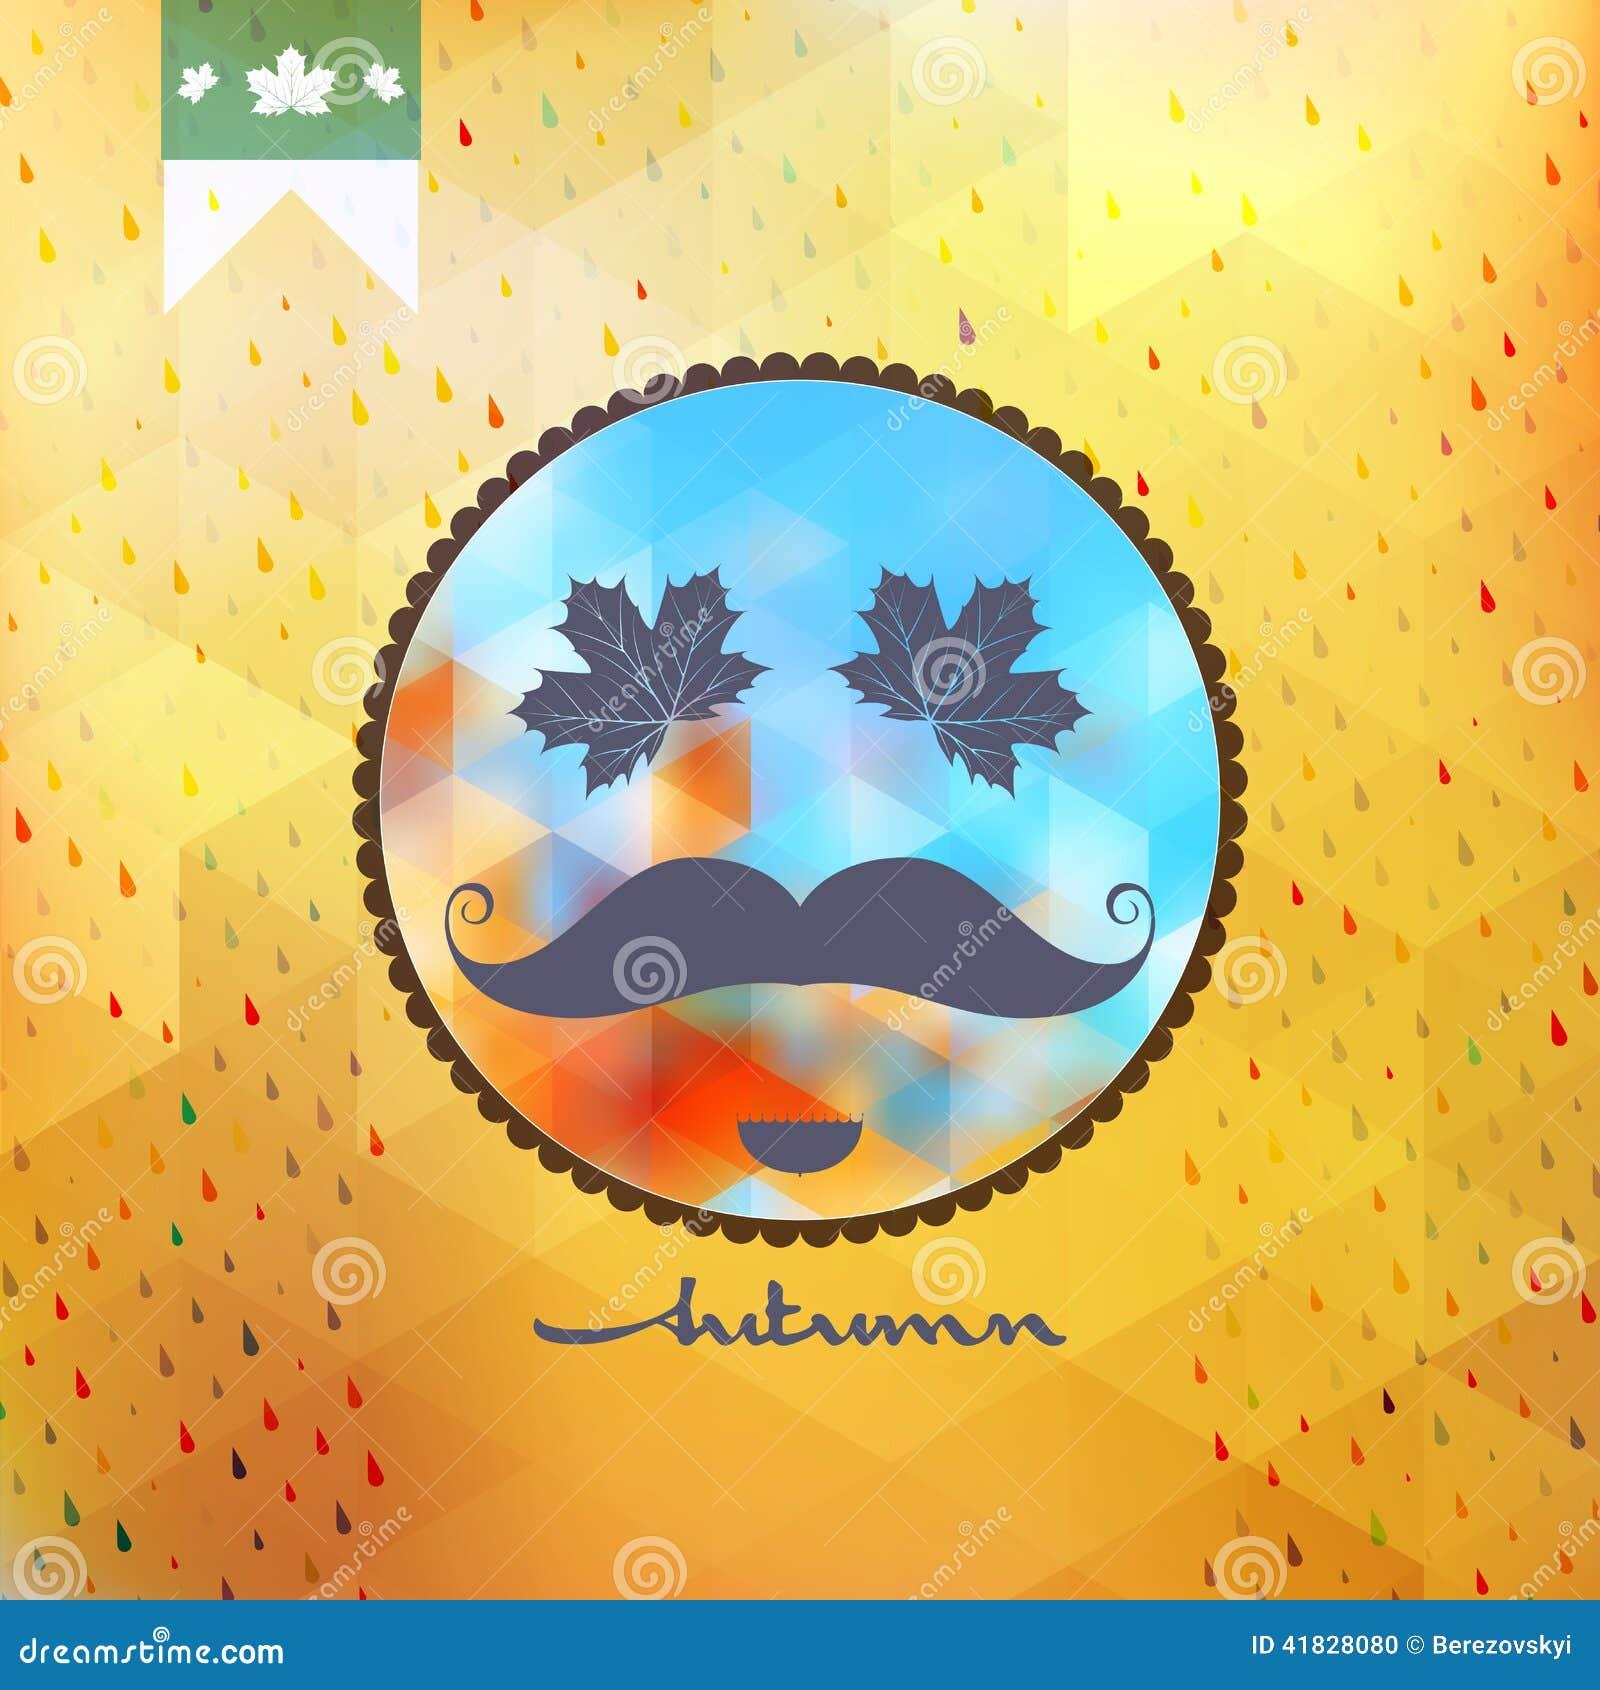 Poster design eps - Autumn Design Mostachos Poster